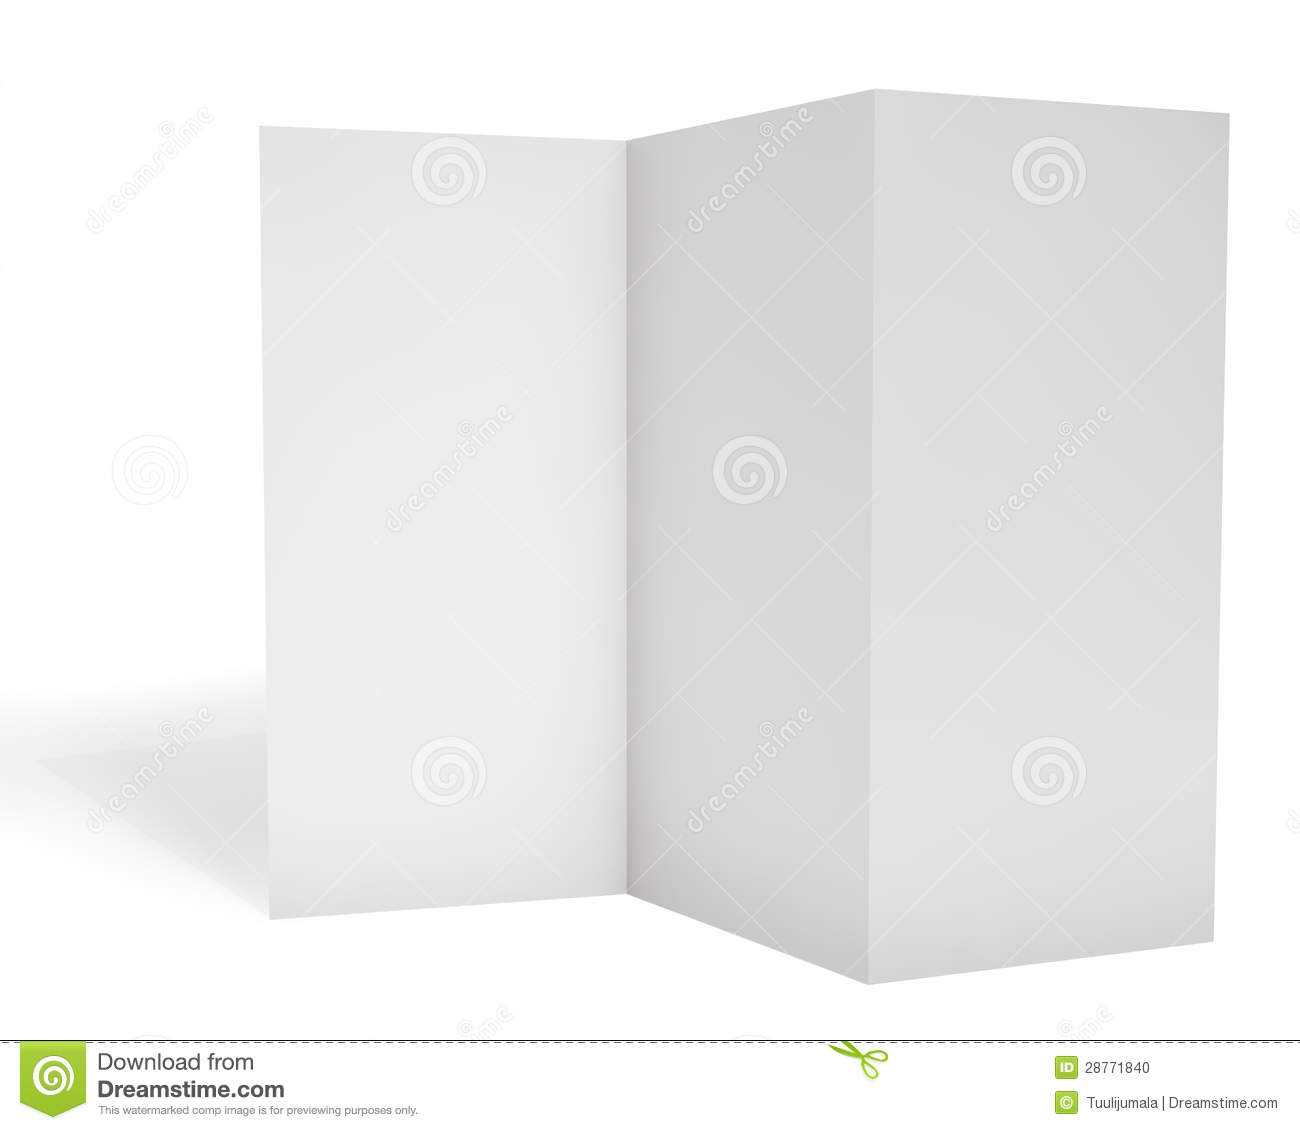 Blank Triple Leaflet Template Stock Illustration With Travel Brochure Template Ks2